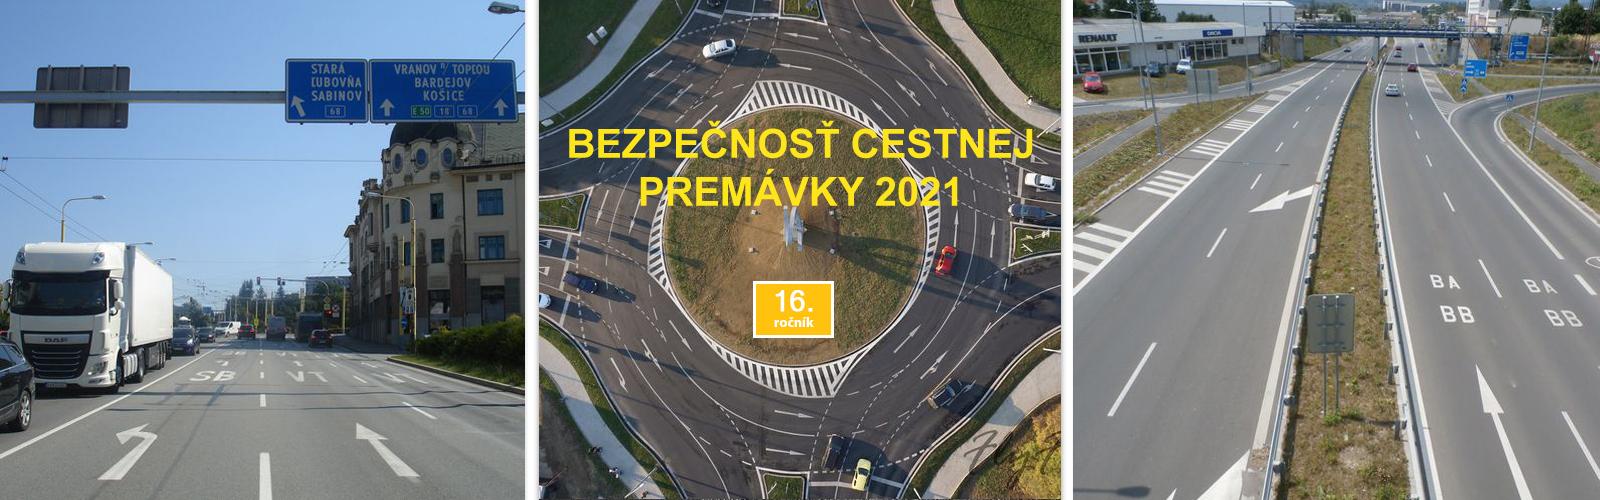 becep 2021 new